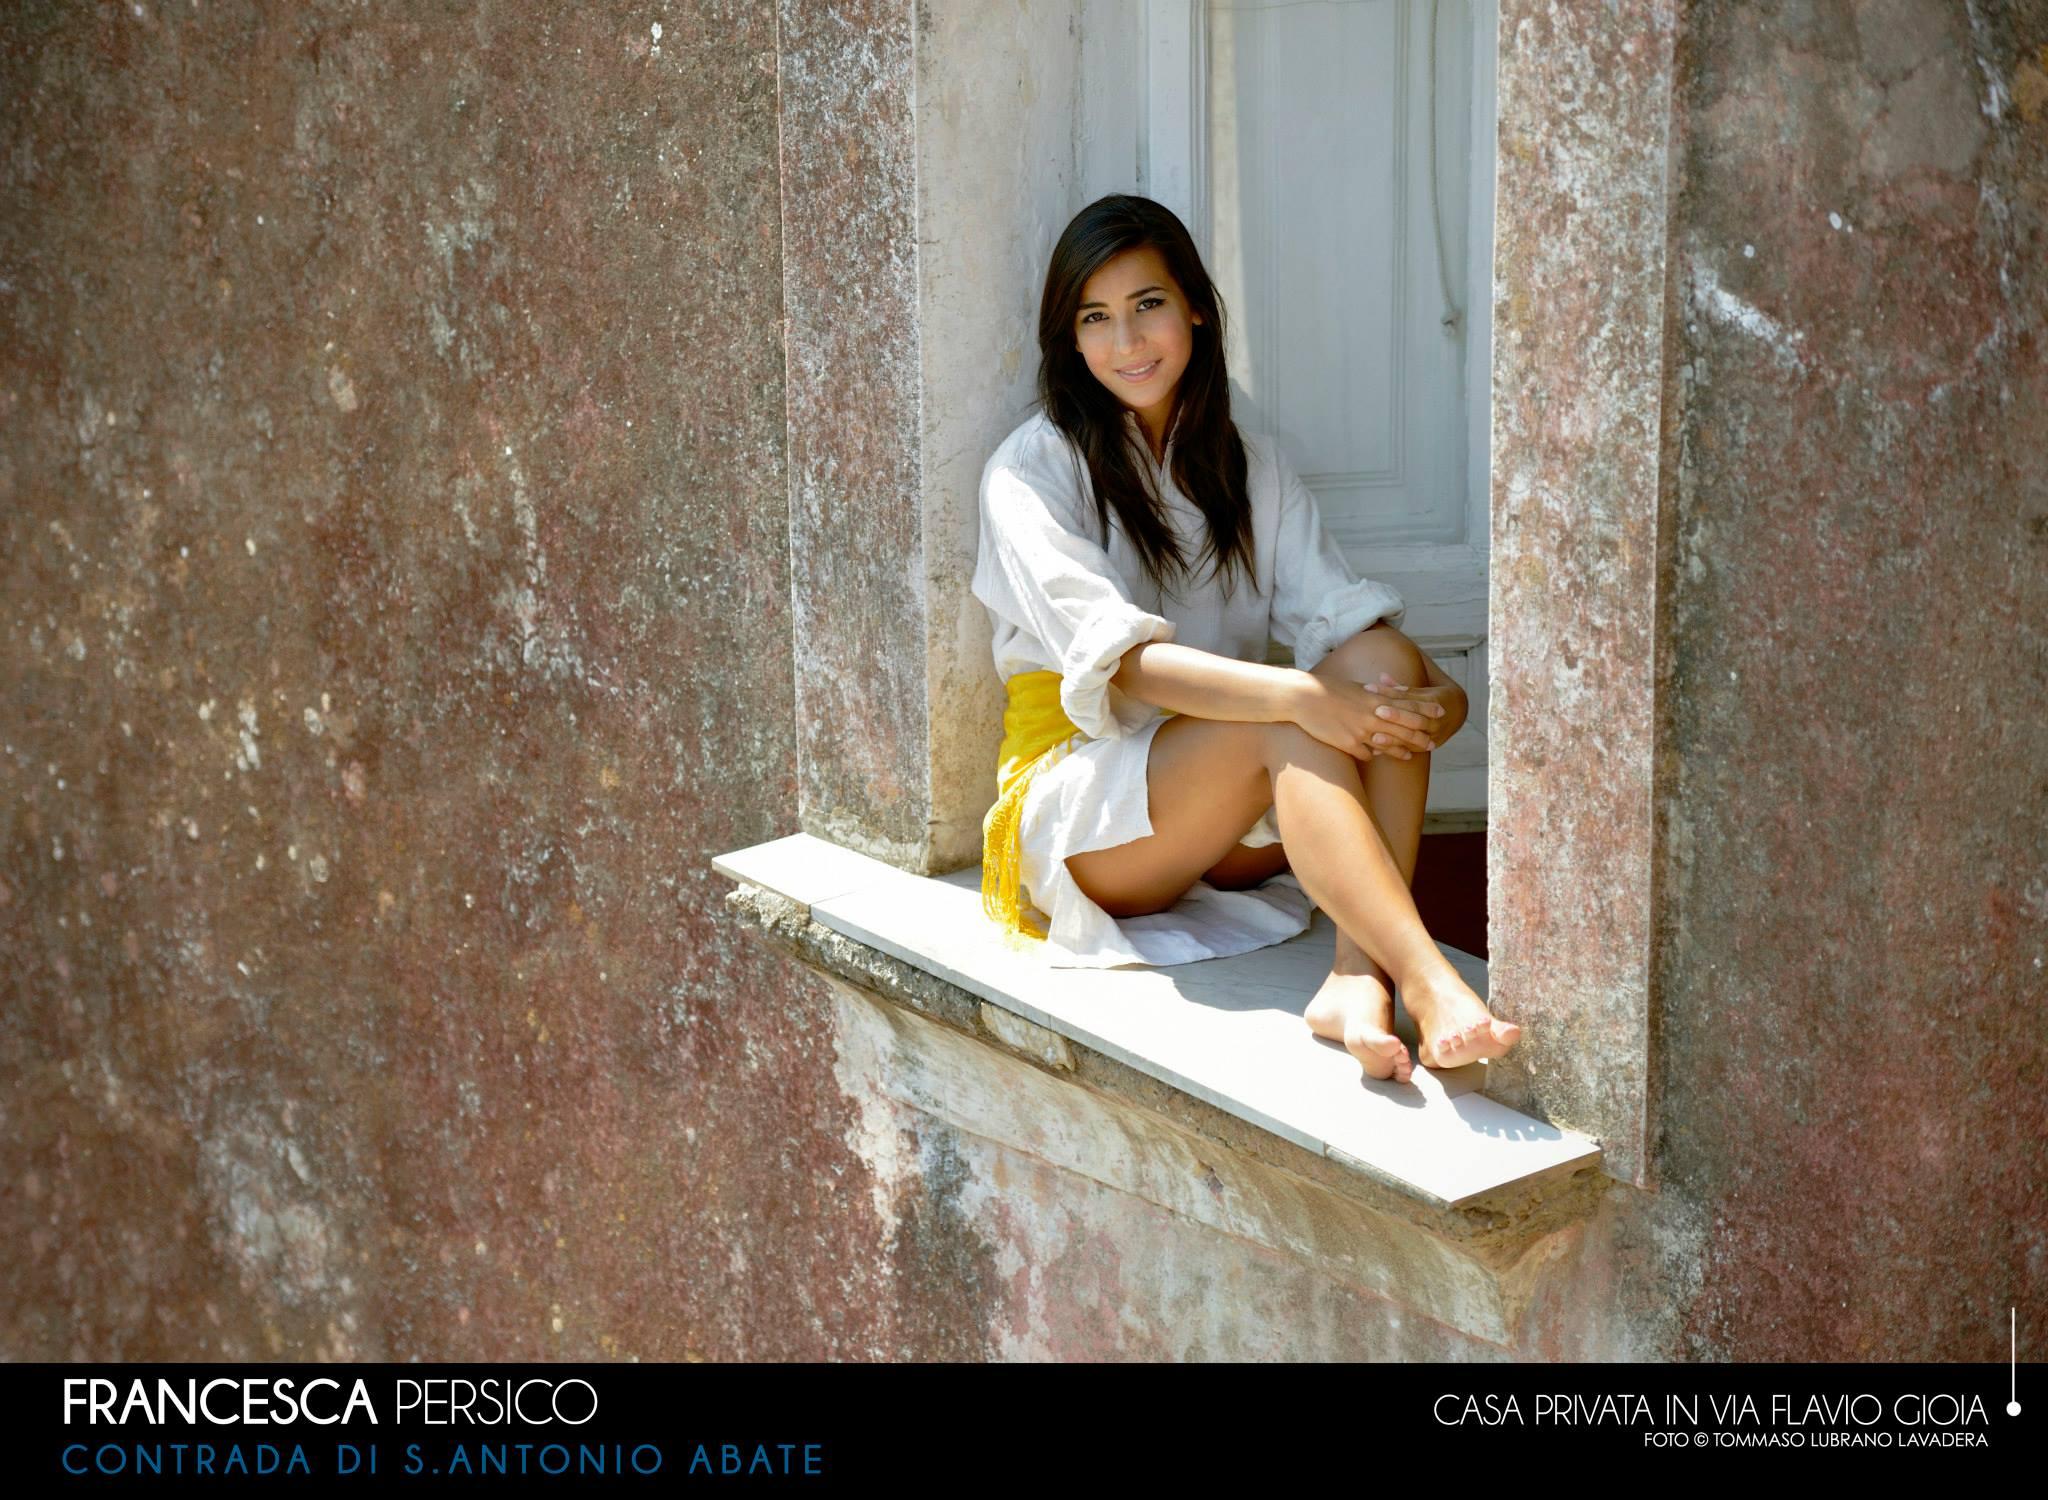 Francesca Persico